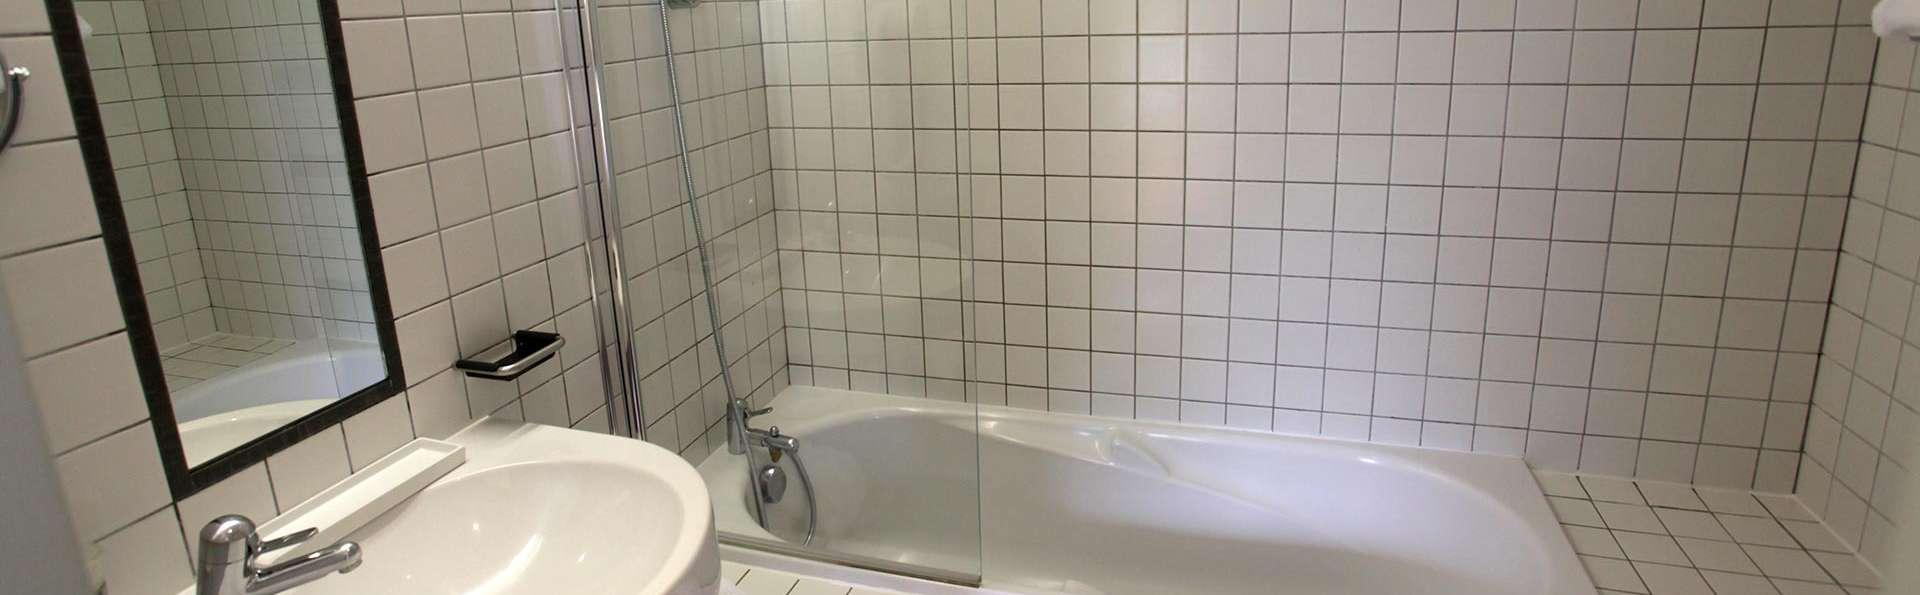 Domaine de Barres - Edit_Bathroom.jpg